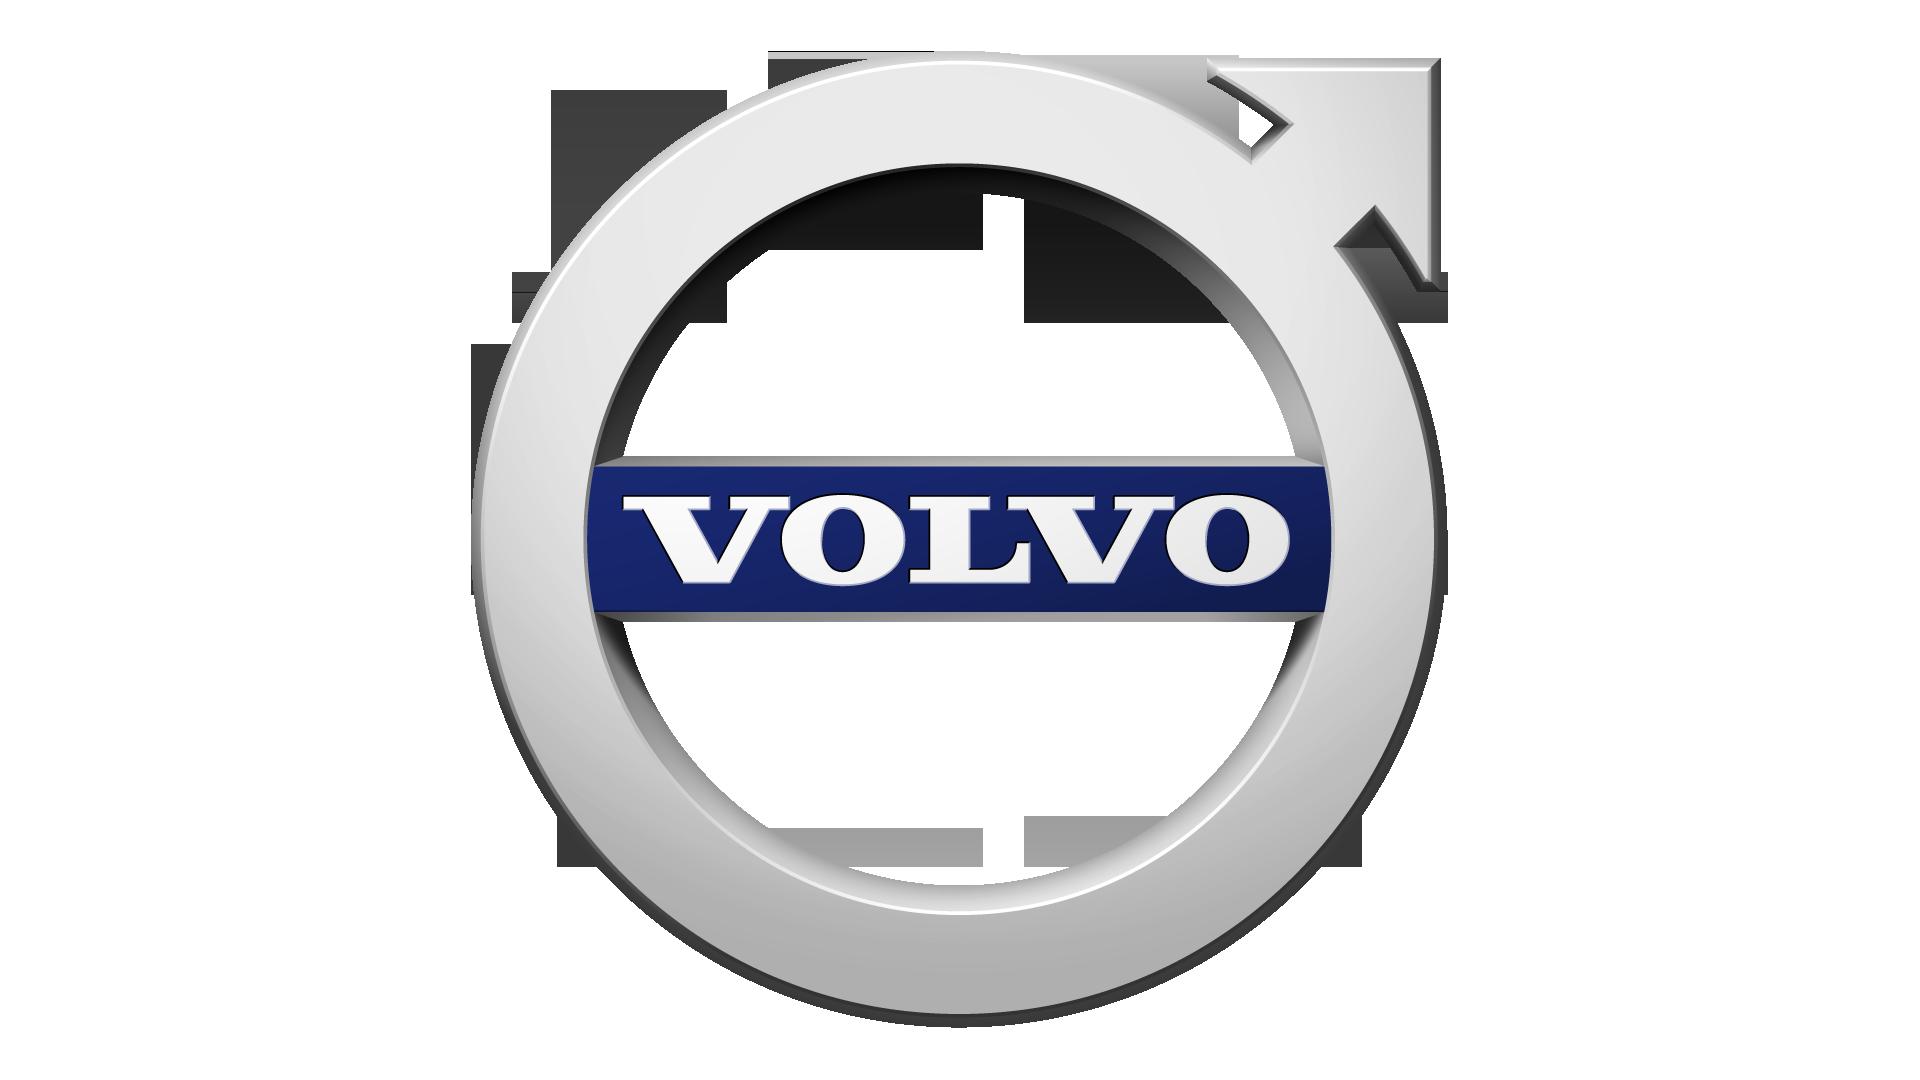 Volvo Logo HD Png Meaning Information Carlogosorg 1920x1080